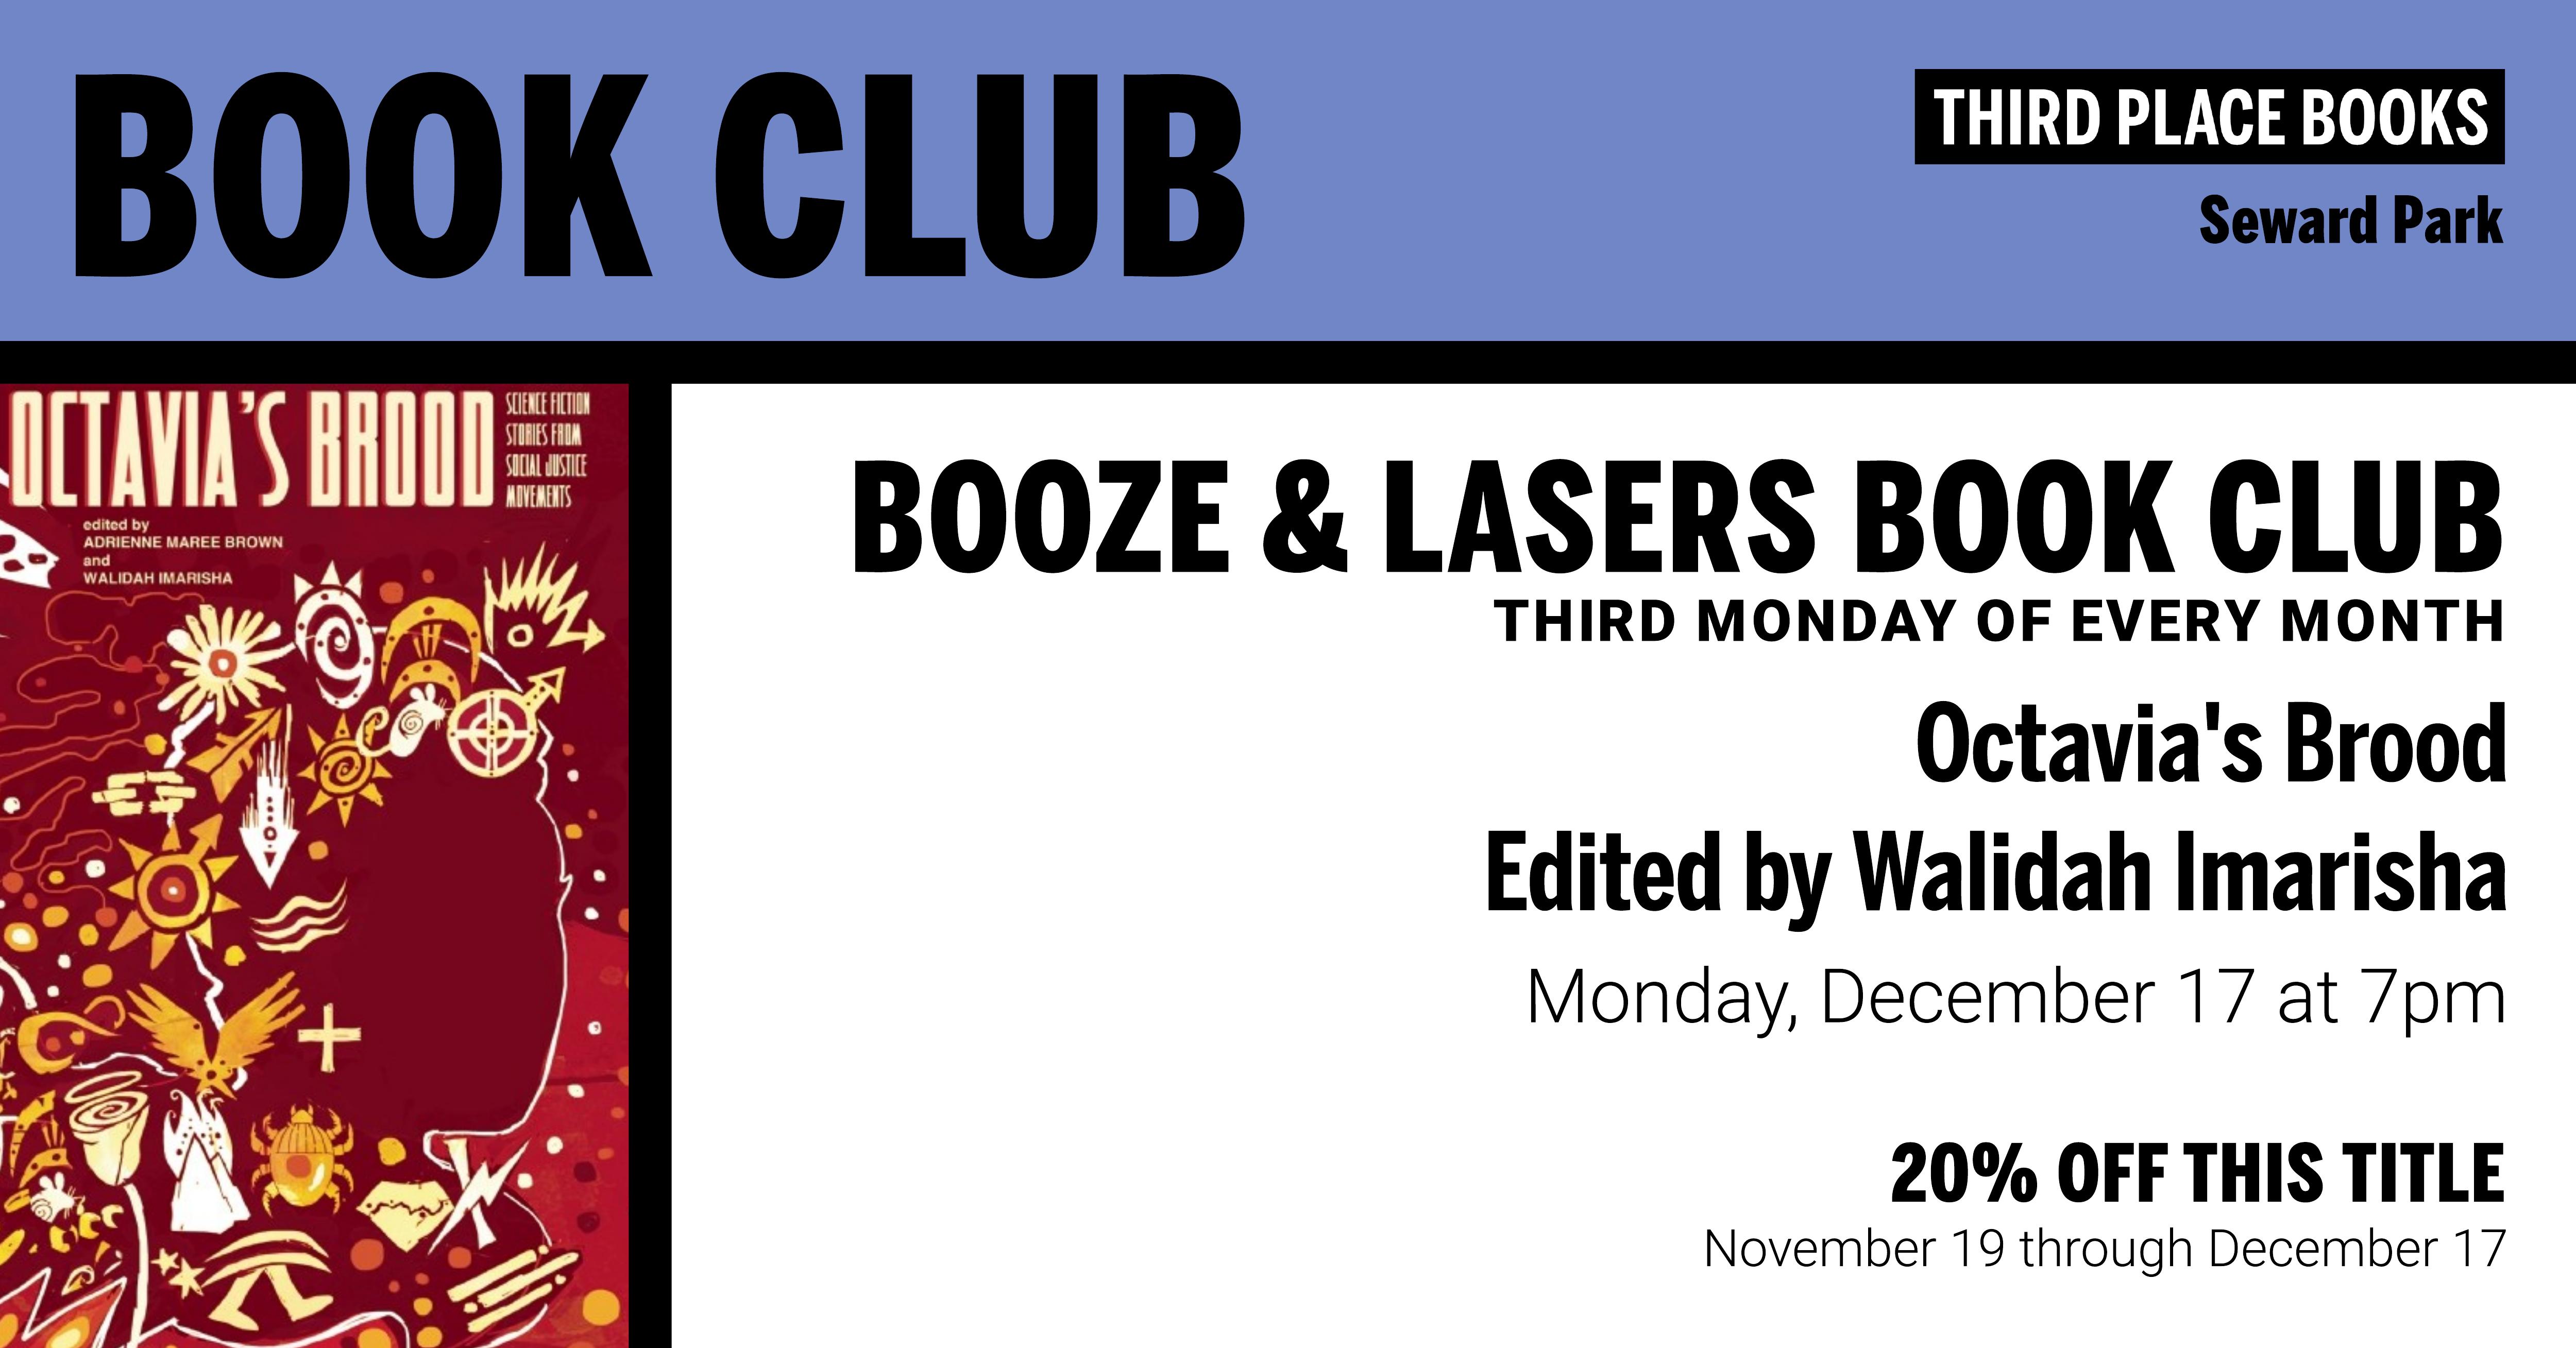 Booze & Lasers Book Club reading Octavia's Brood edited by Walidah Imarisha on December 17th at 7pm